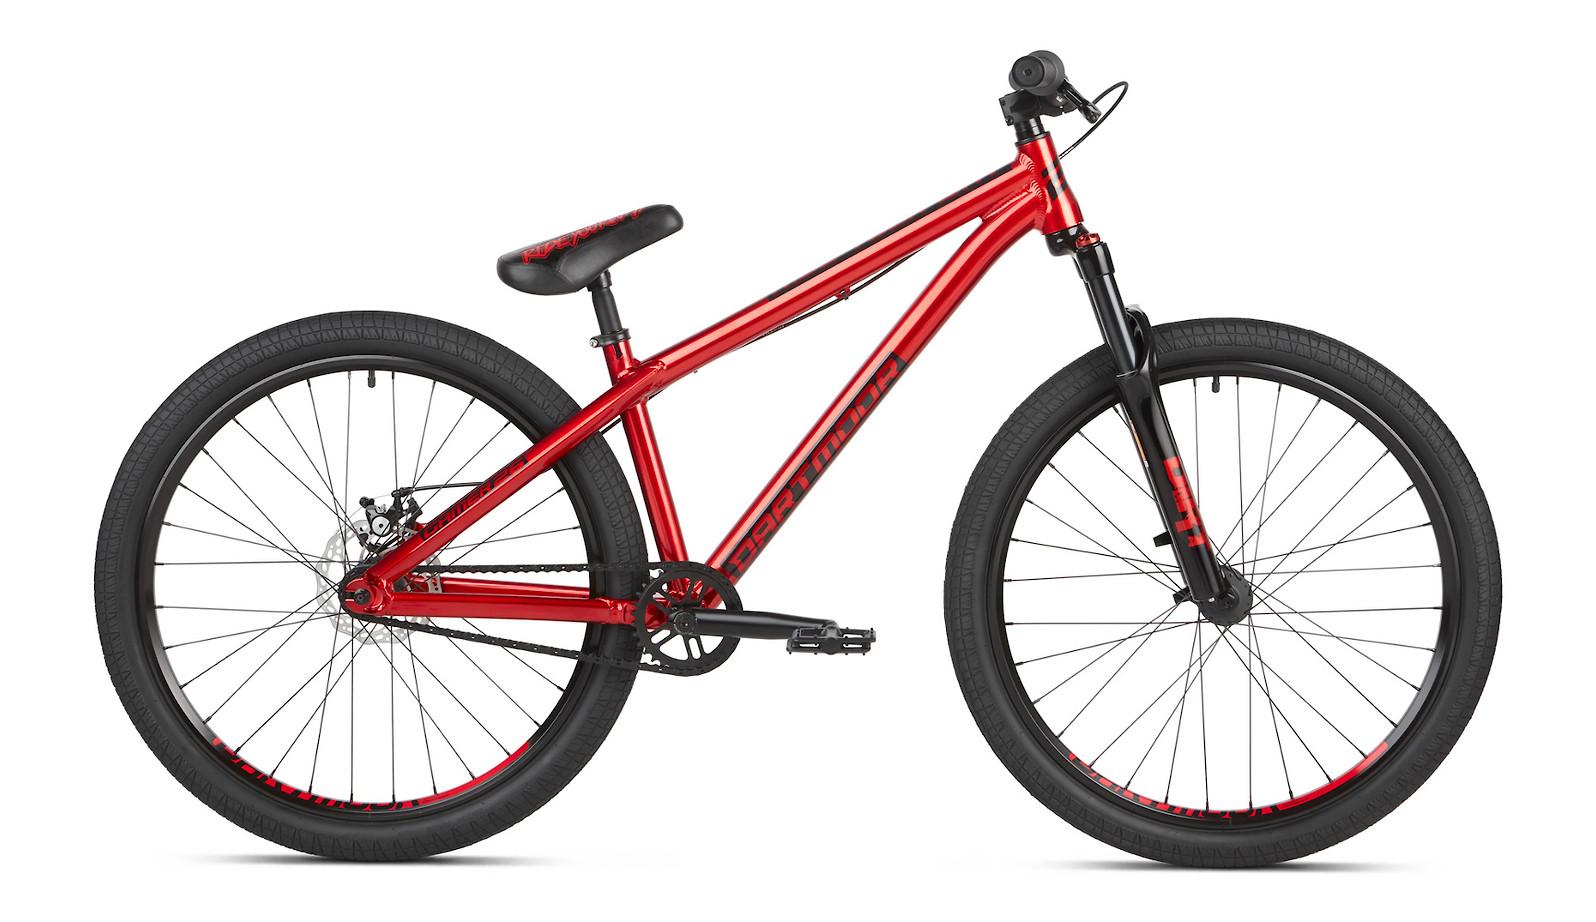 2019 Dartmoor Gamer Intro 26 Bike